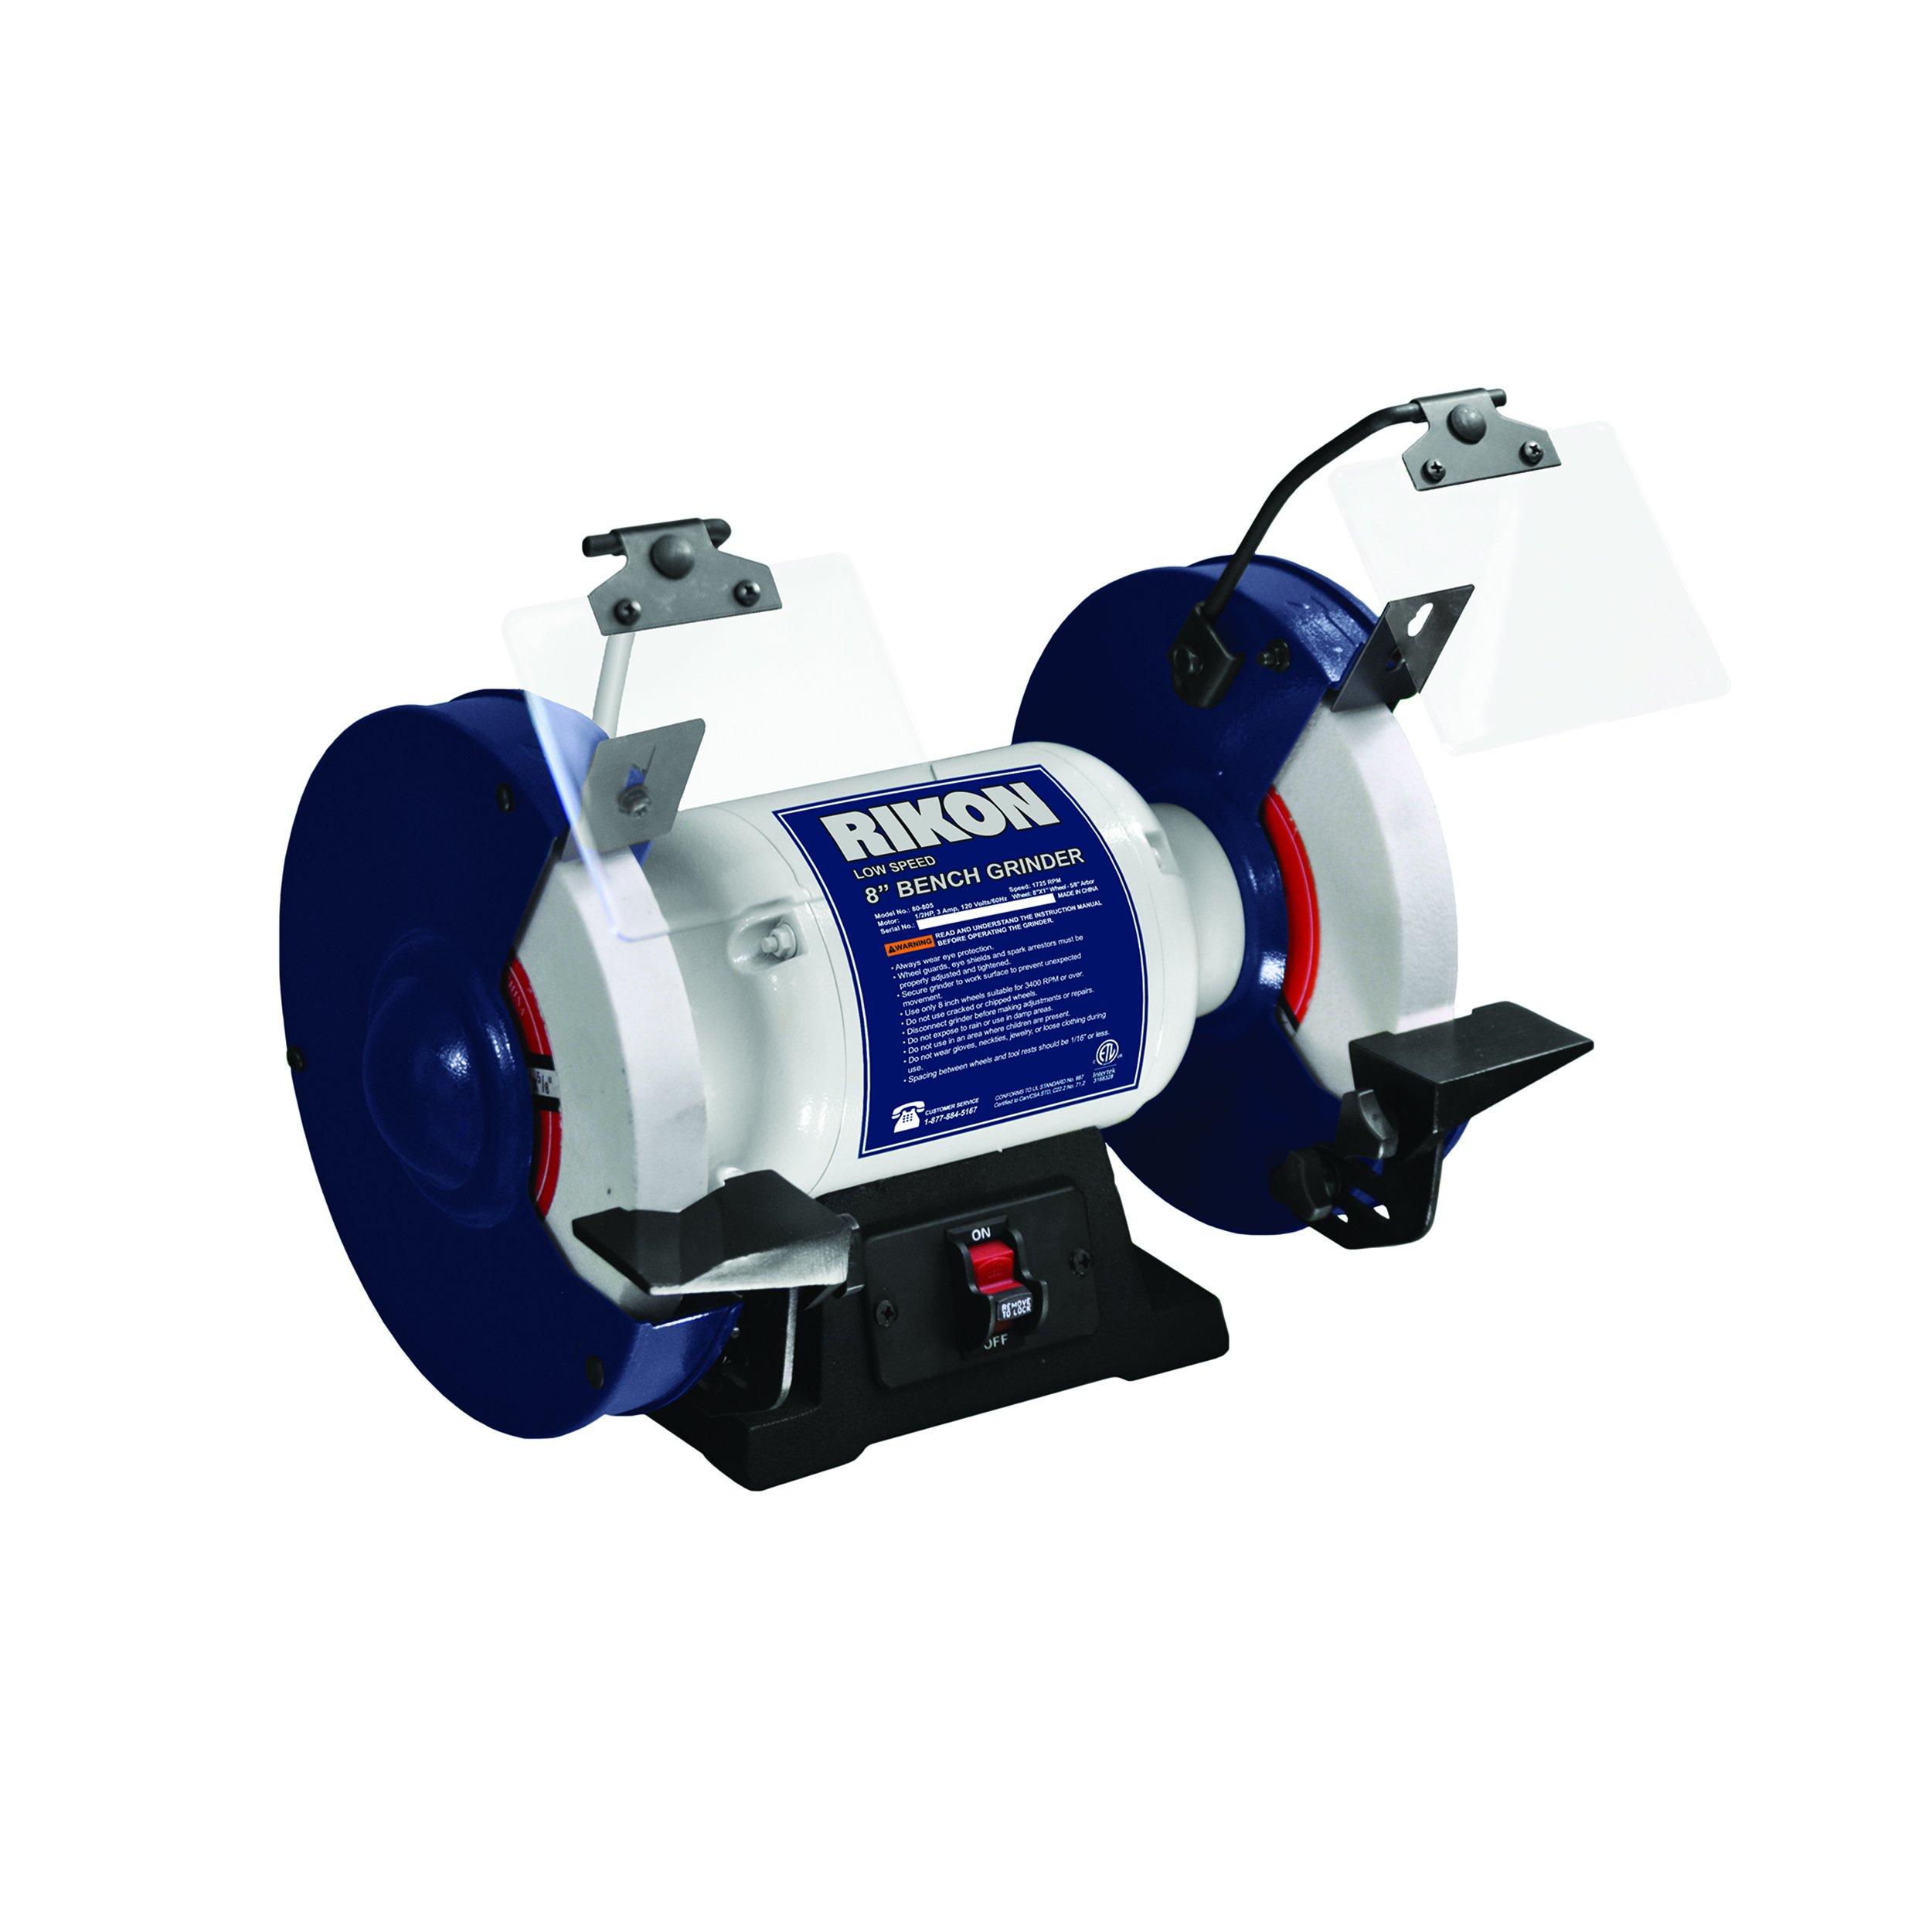 RIKON Power Tools 80-805 8'' Slow Speed Bench Grinder,